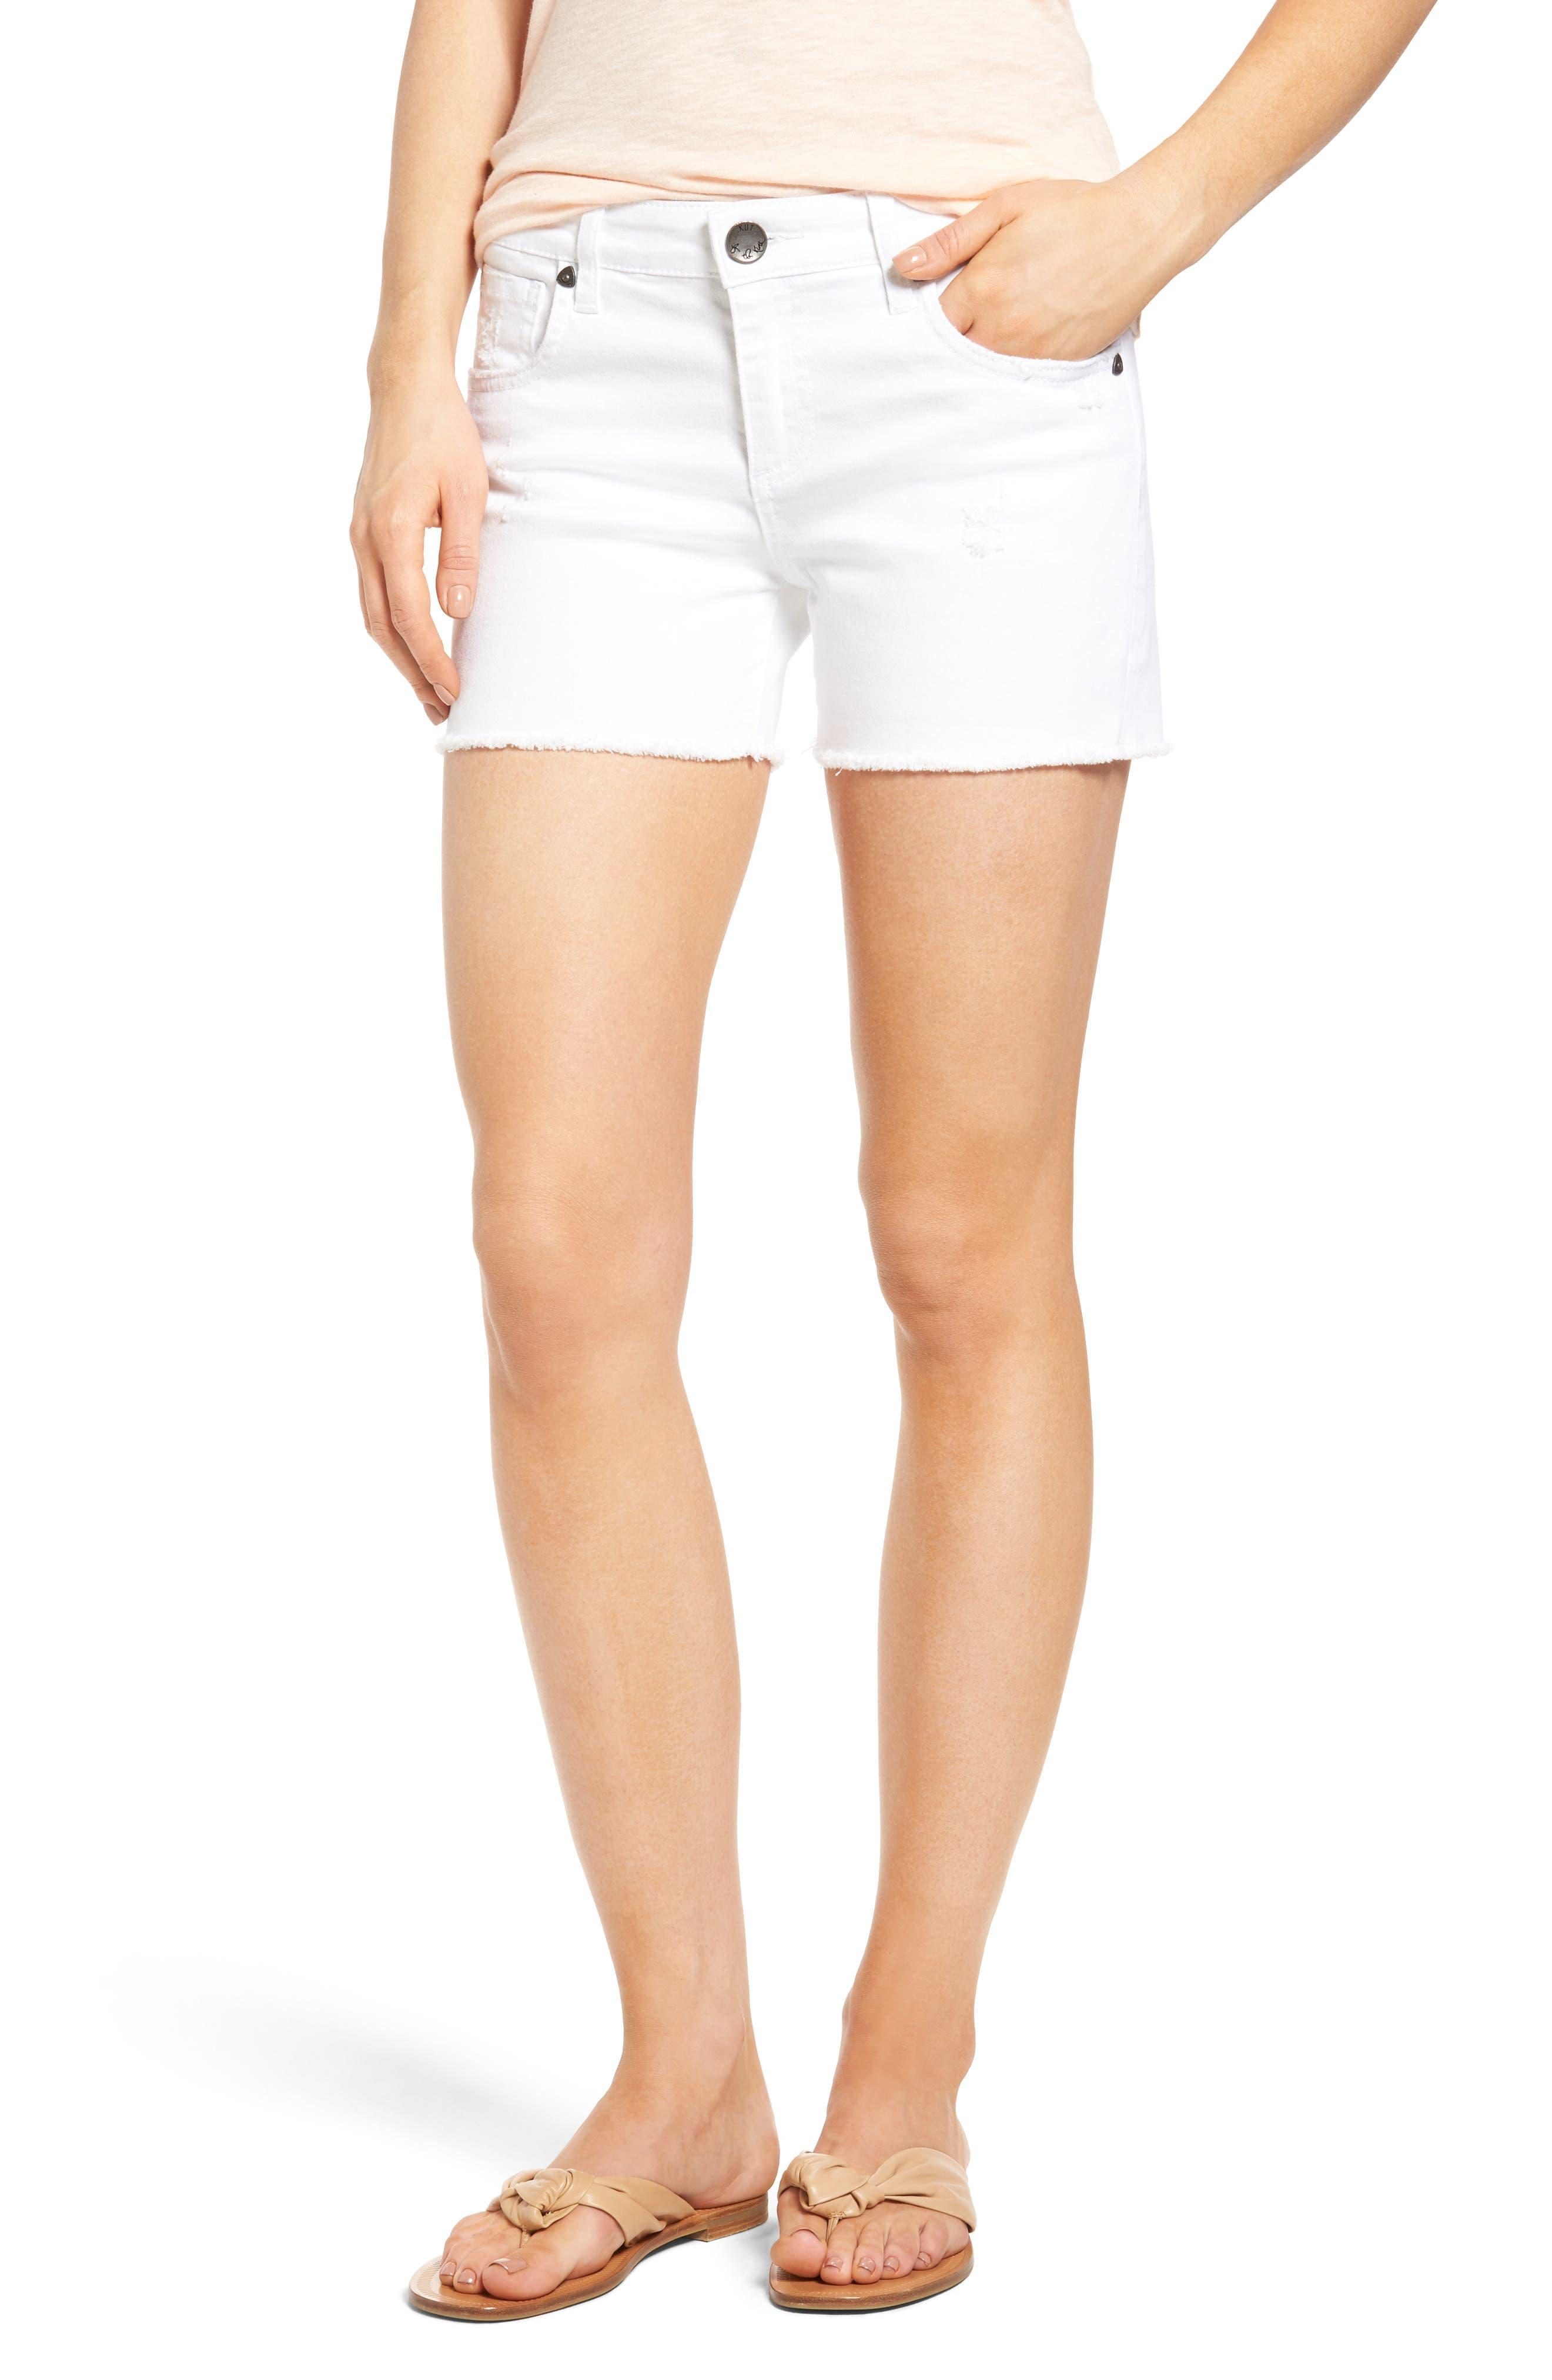 Gidget Denim Shorts,                         Main,                         color, Optic White